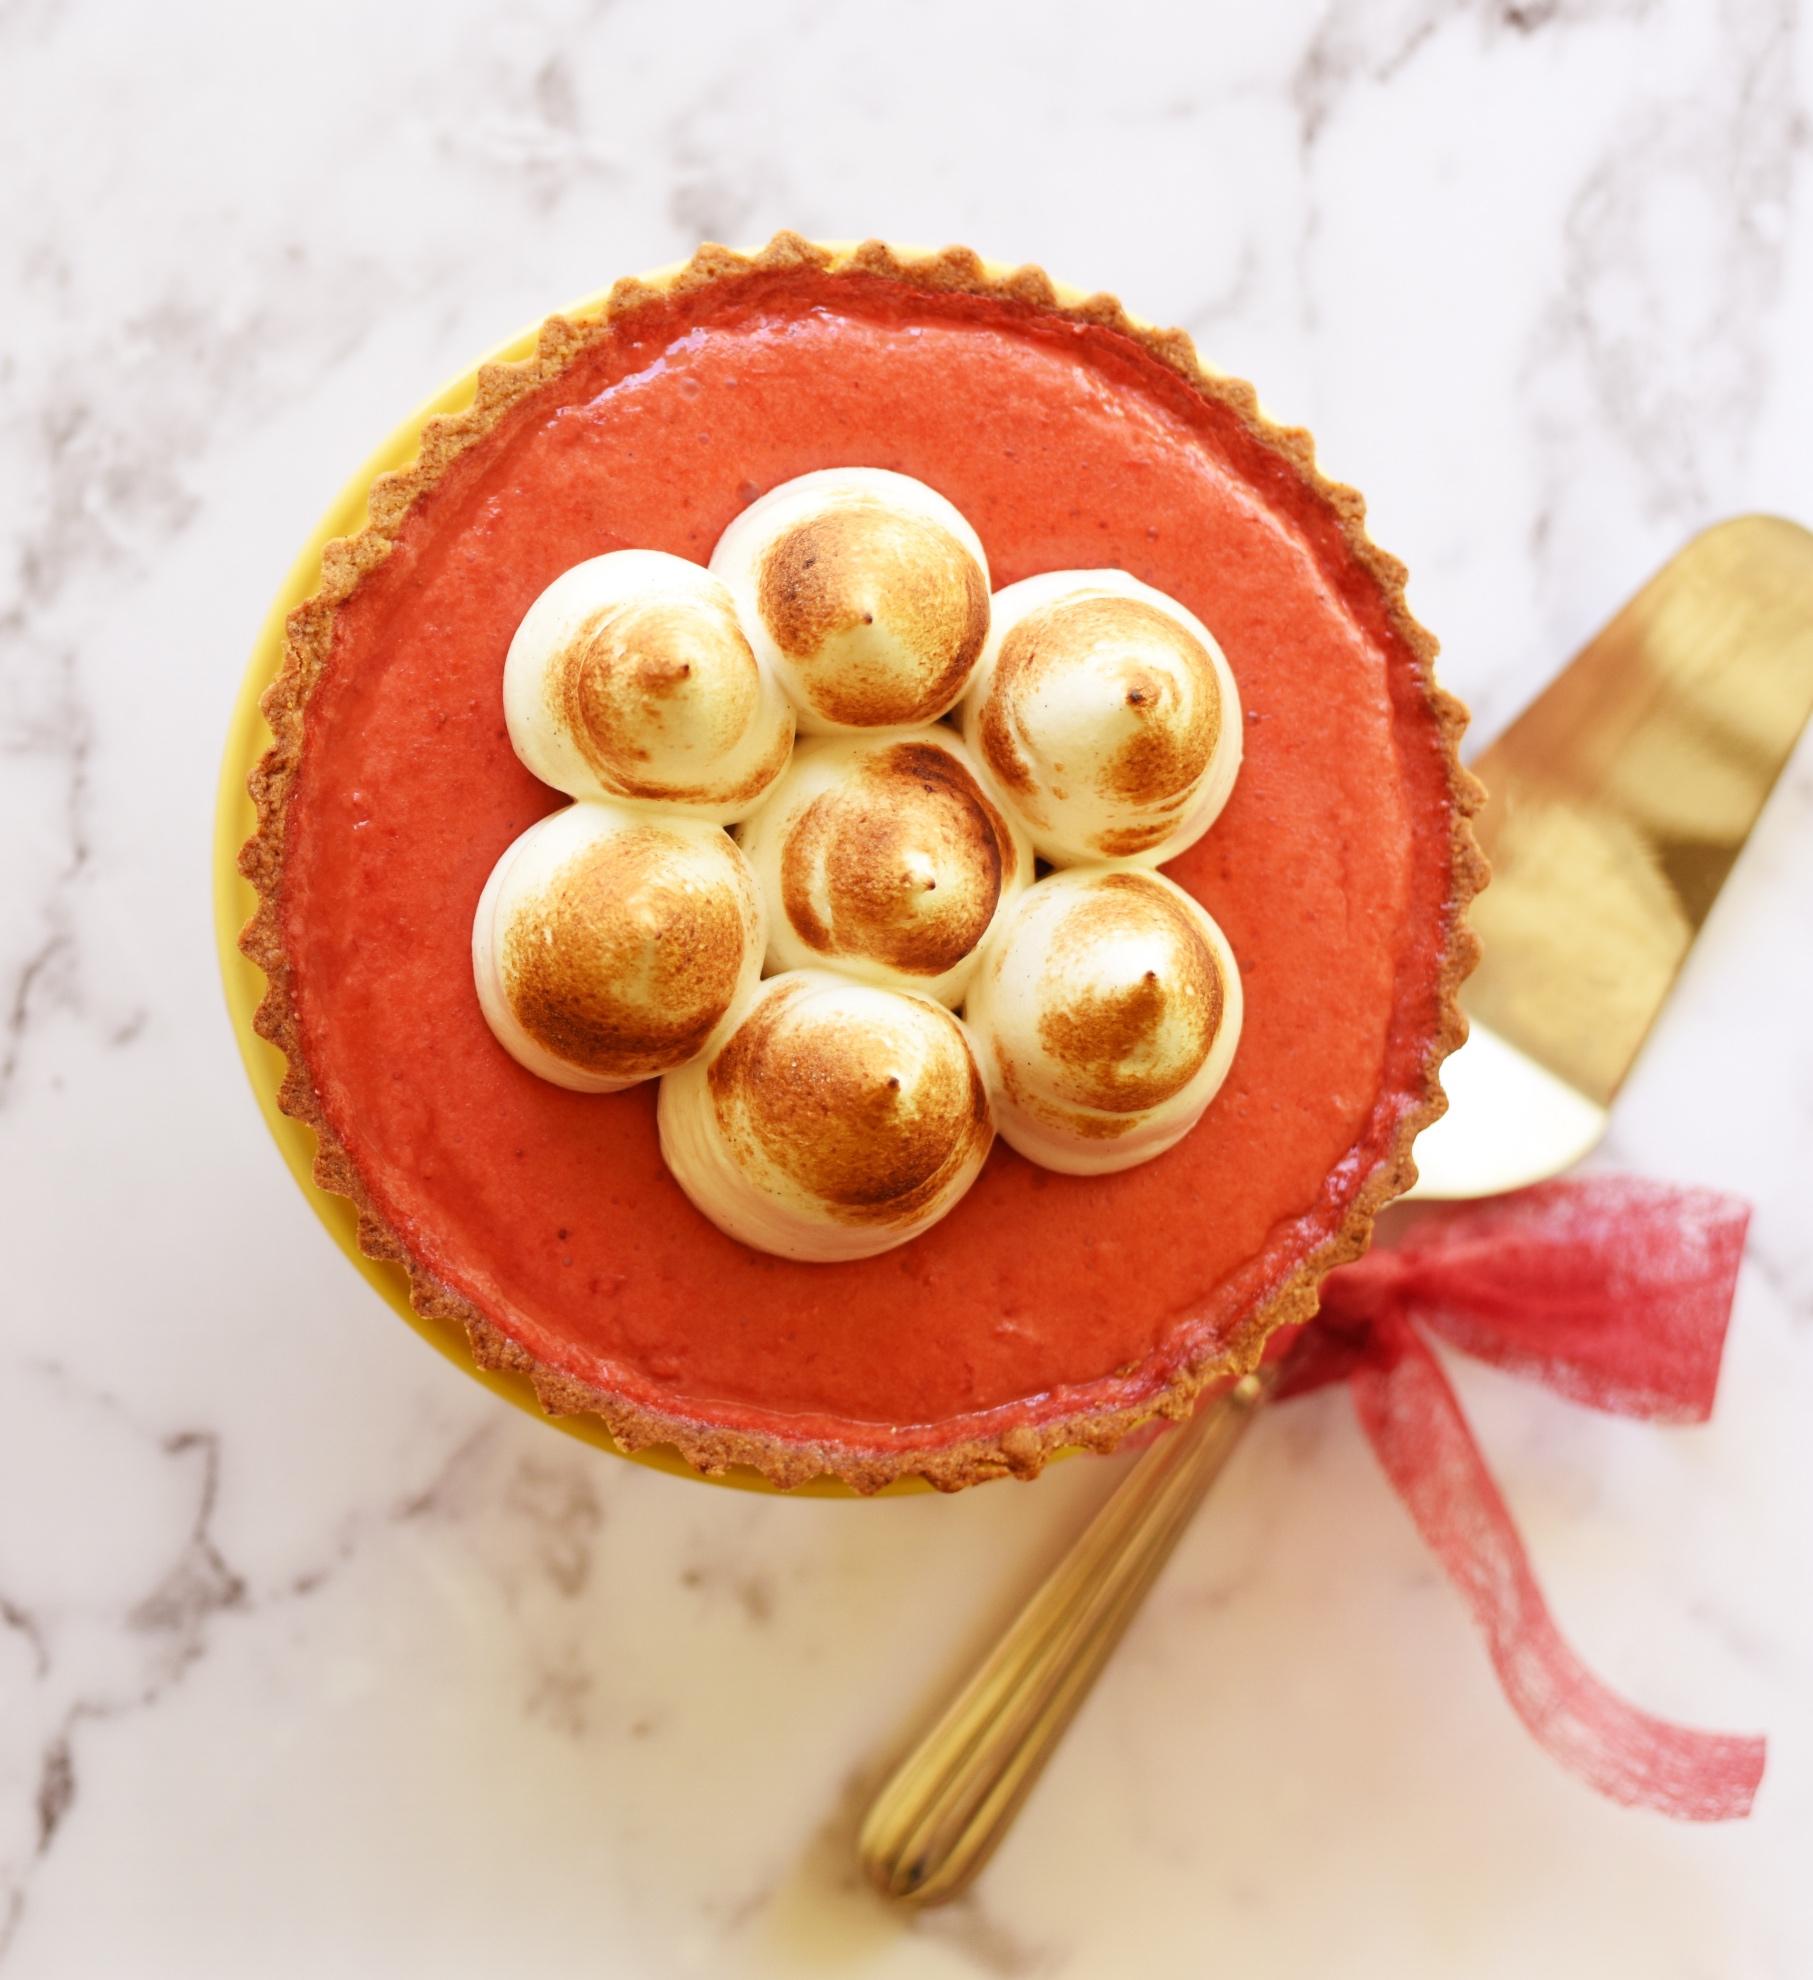 Strawberry Rose Meringue Pie